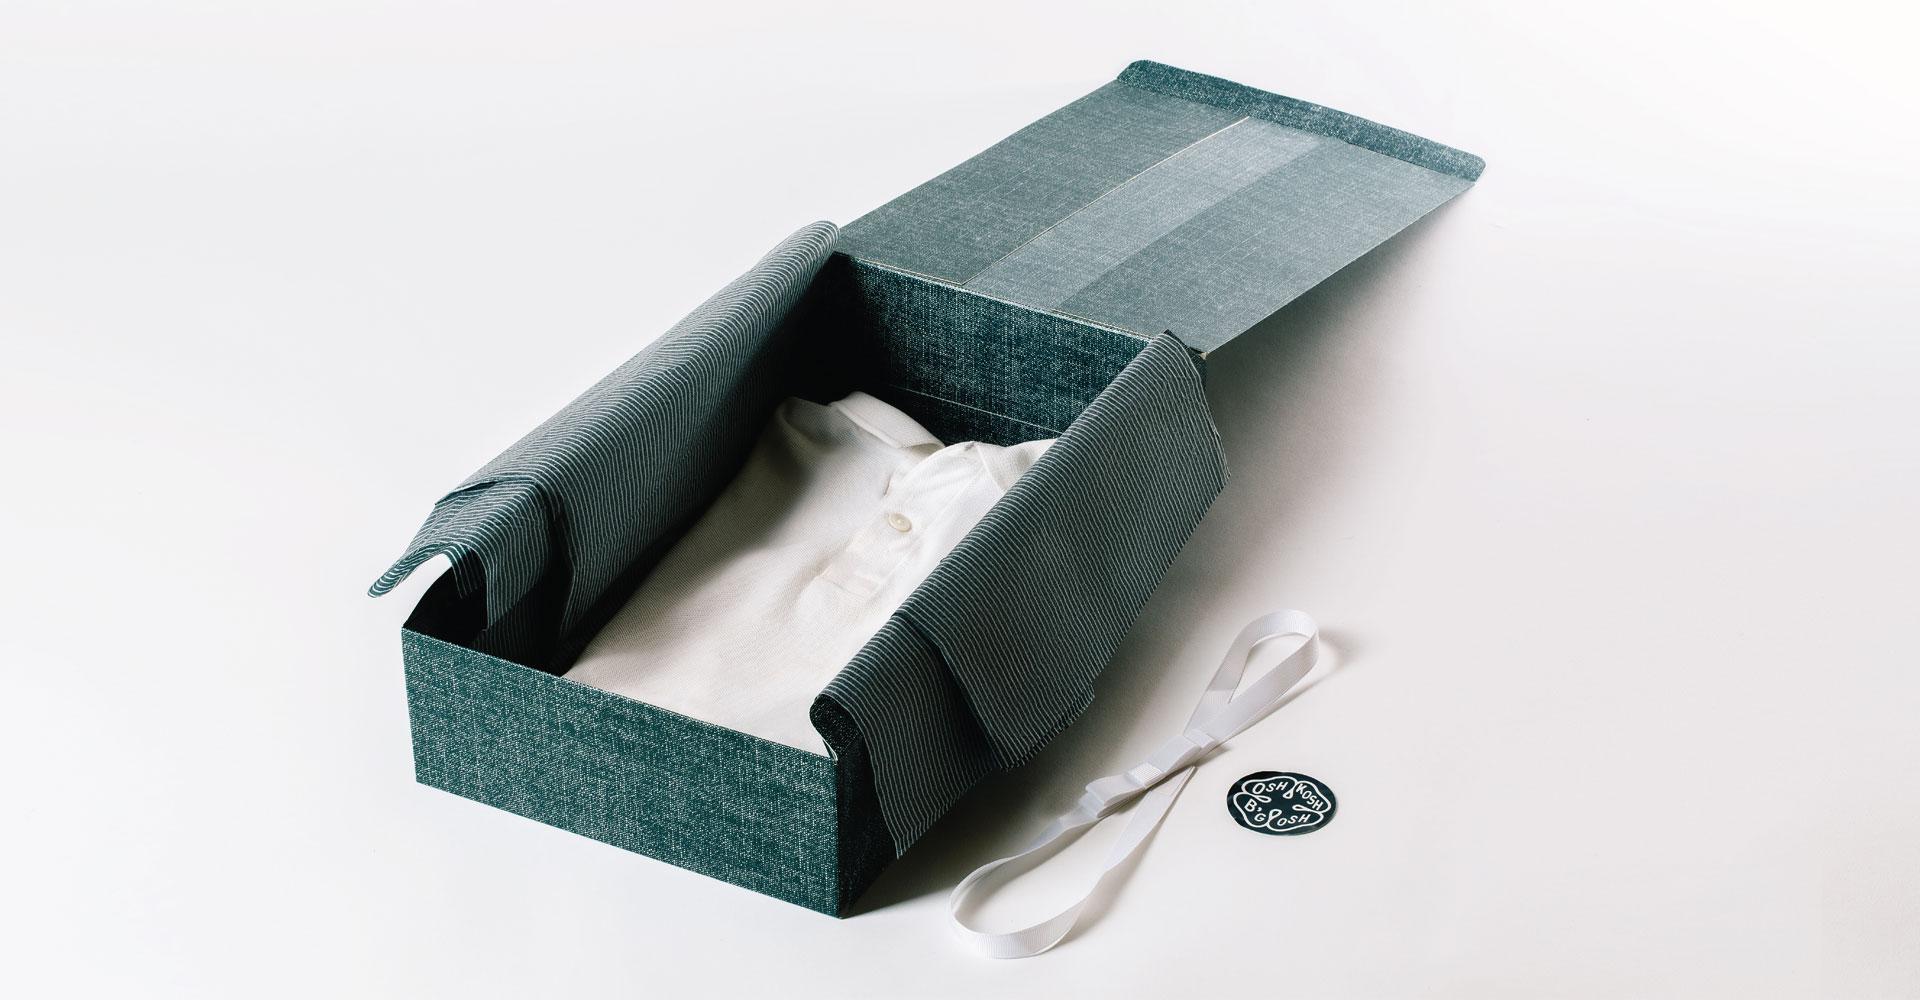 Creative_Retail_Packaging_Package_Design_OshKosh_Bgosh_08.jpg